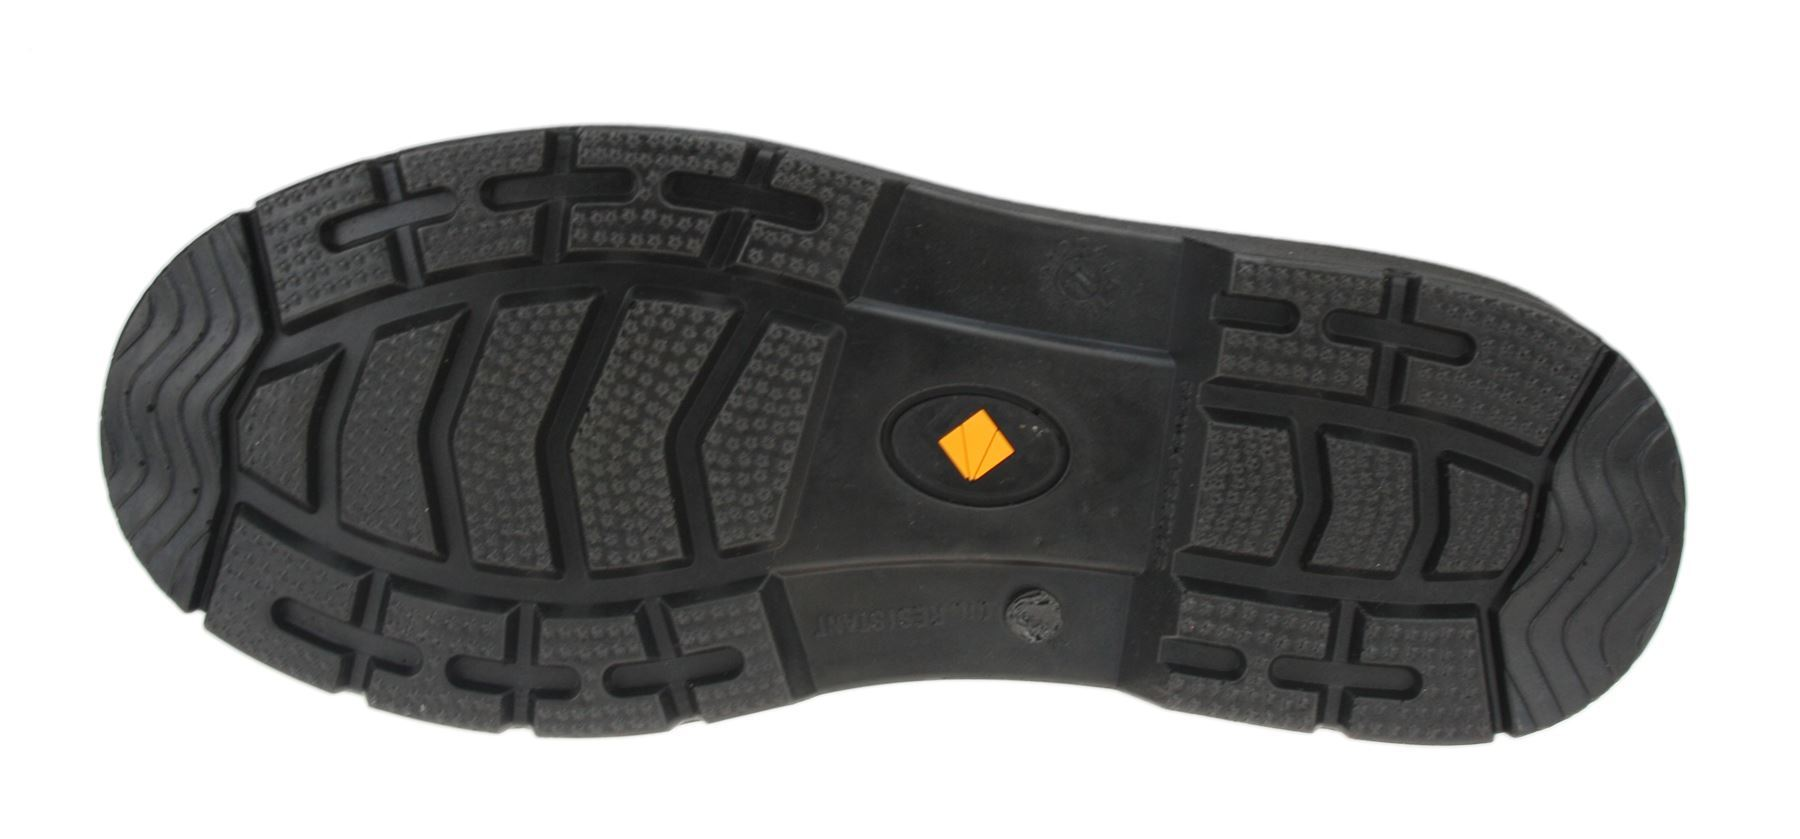 ET Safety I0020 Chelsea Black Slip On Safety Leather Work Toecap Boots